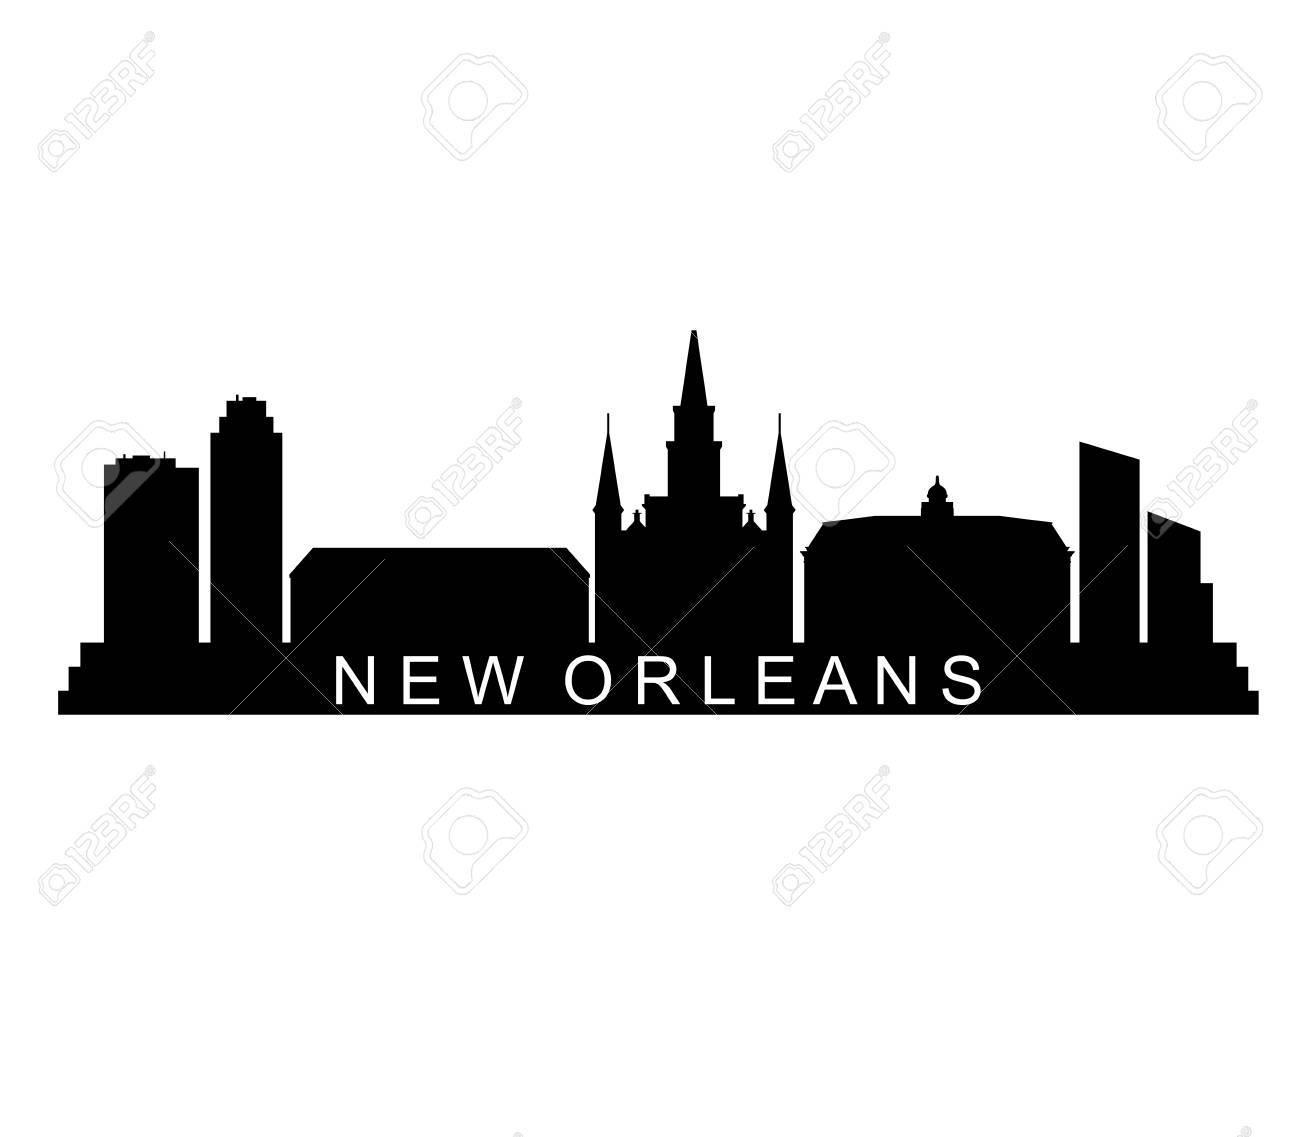 New orleans skyline.